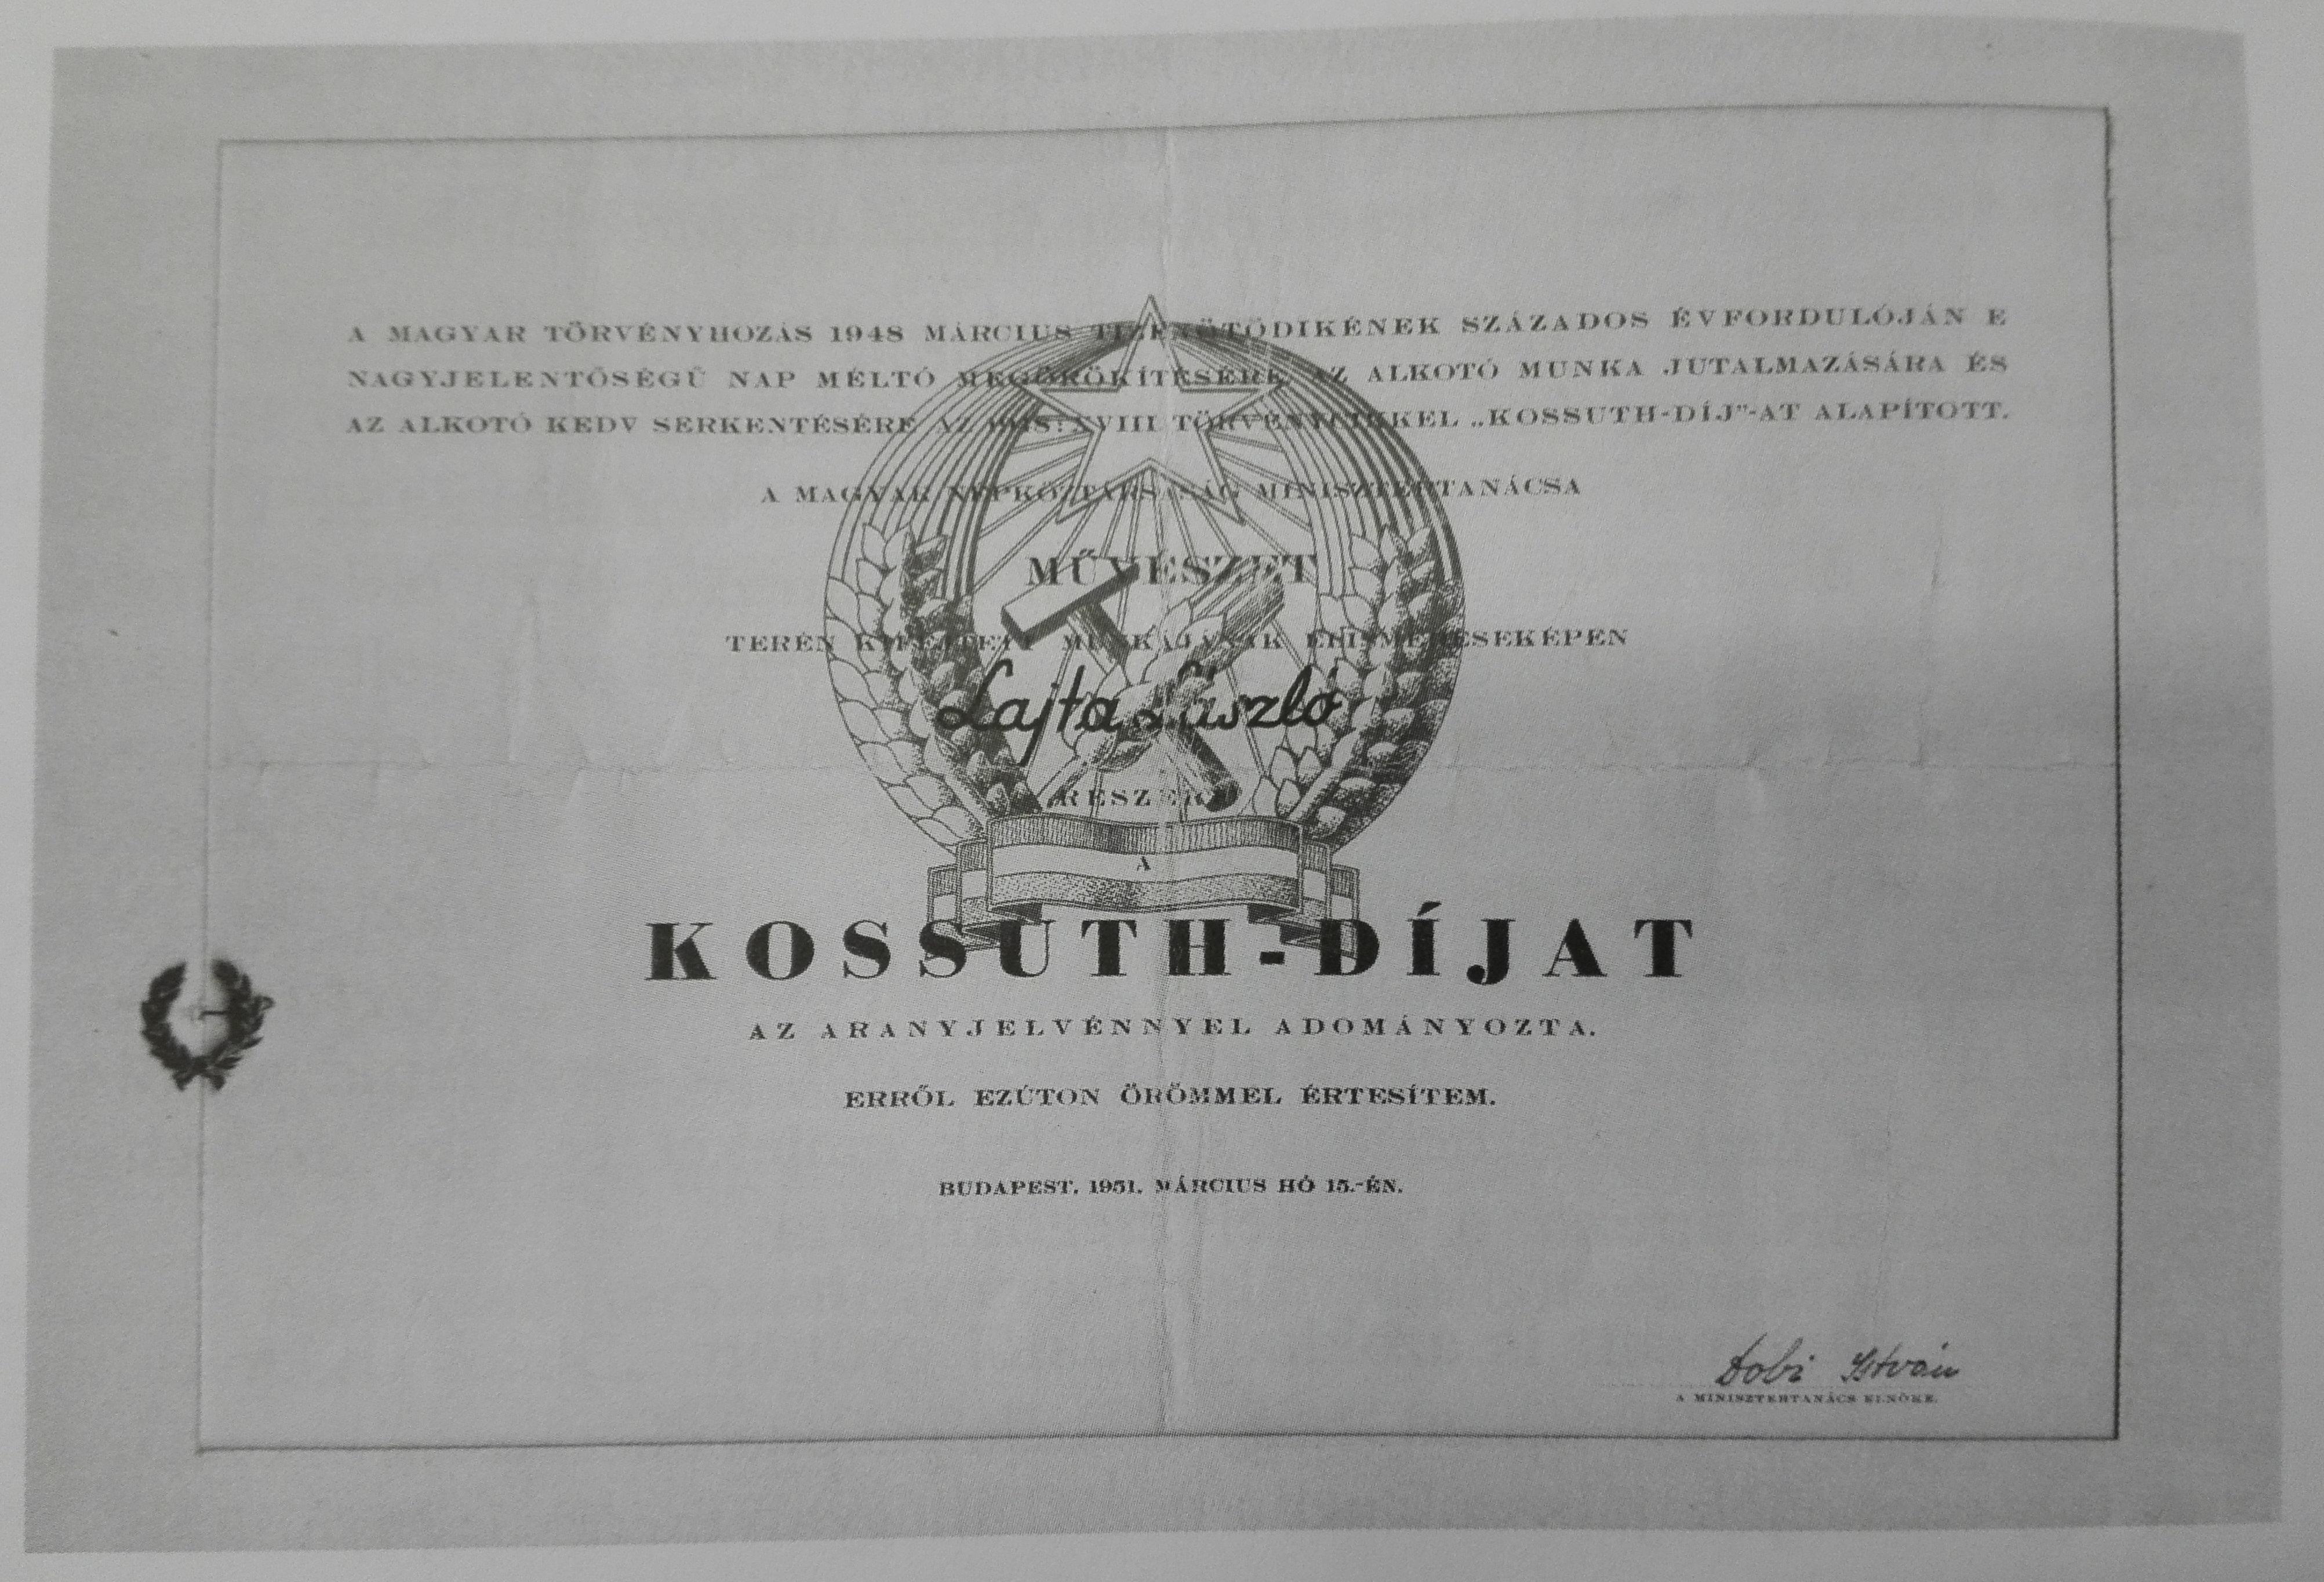 Kossuth Prize of Lajtha, László